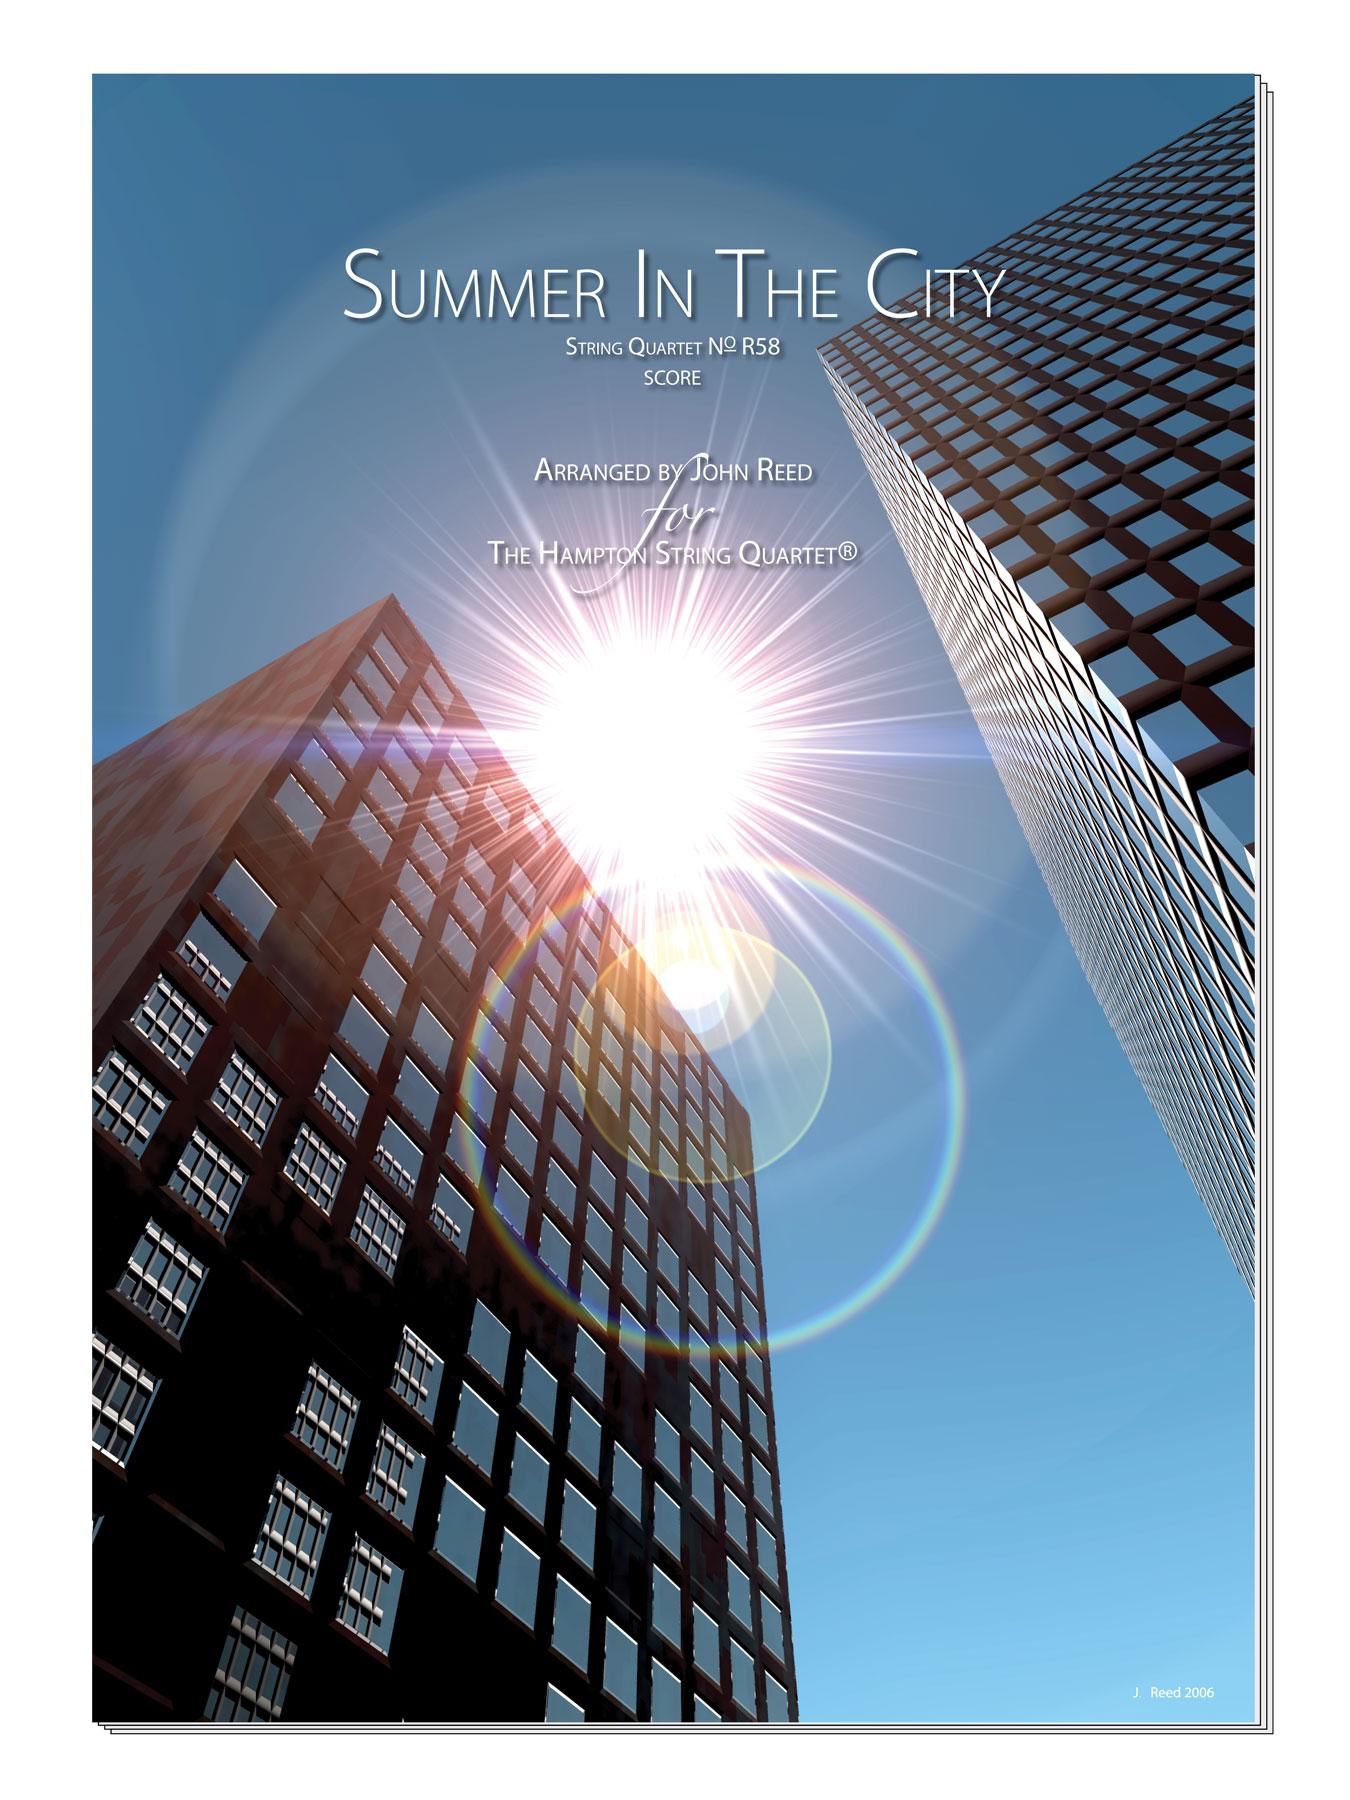 SummerInTheCity.jpg